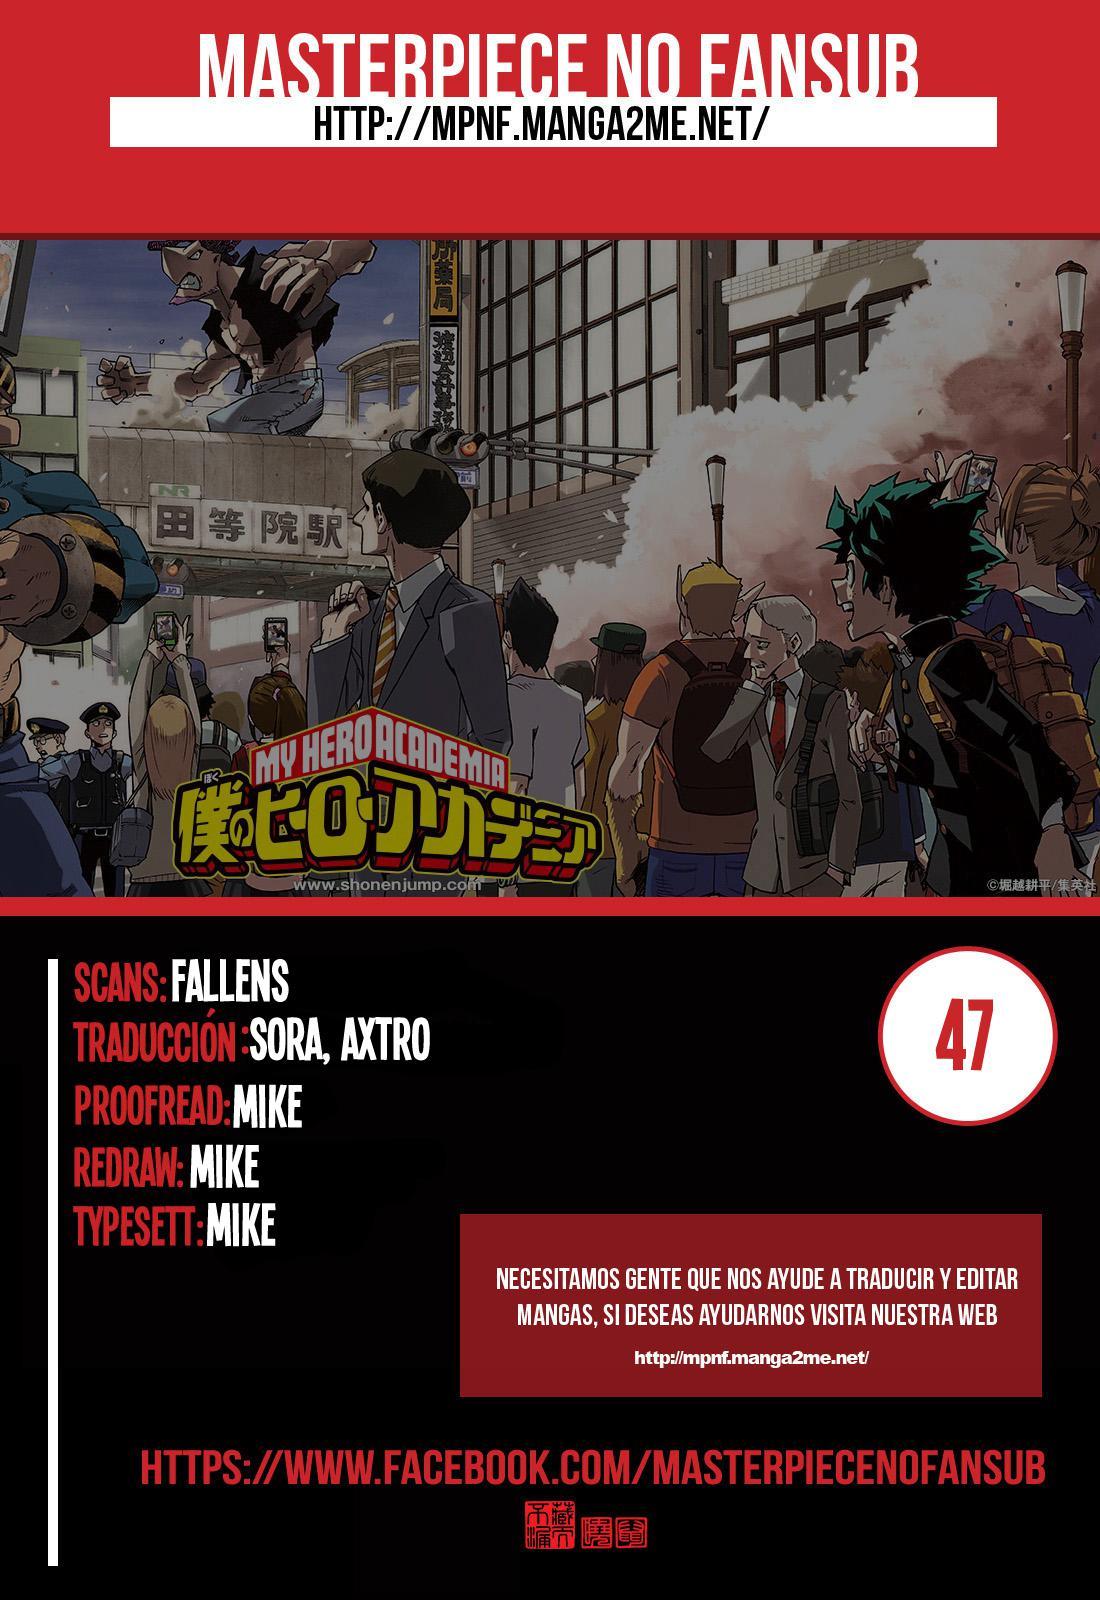 http://c5.ninemanga.com/es_manga/54/182/382436/e59ba389761bfb7fd837d775b17314ca.jpg Page 1